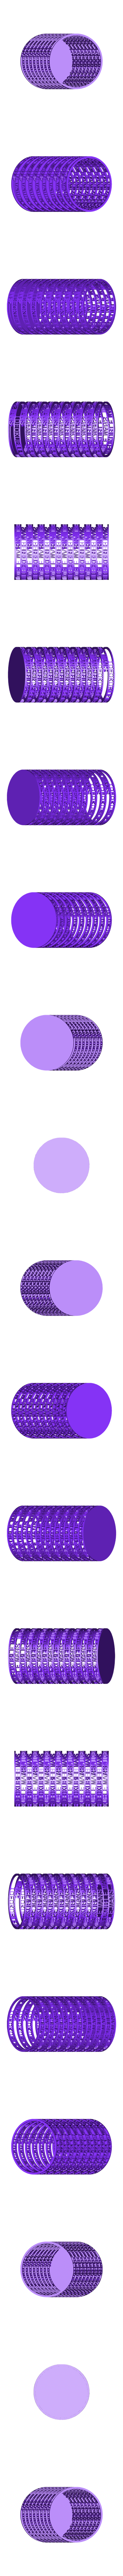 IDEOKUB.stl Download STL file IDEOKUB LE MANS-1 PERSONALIZABLE PENCIL • Object to 3D print, Ibarakel